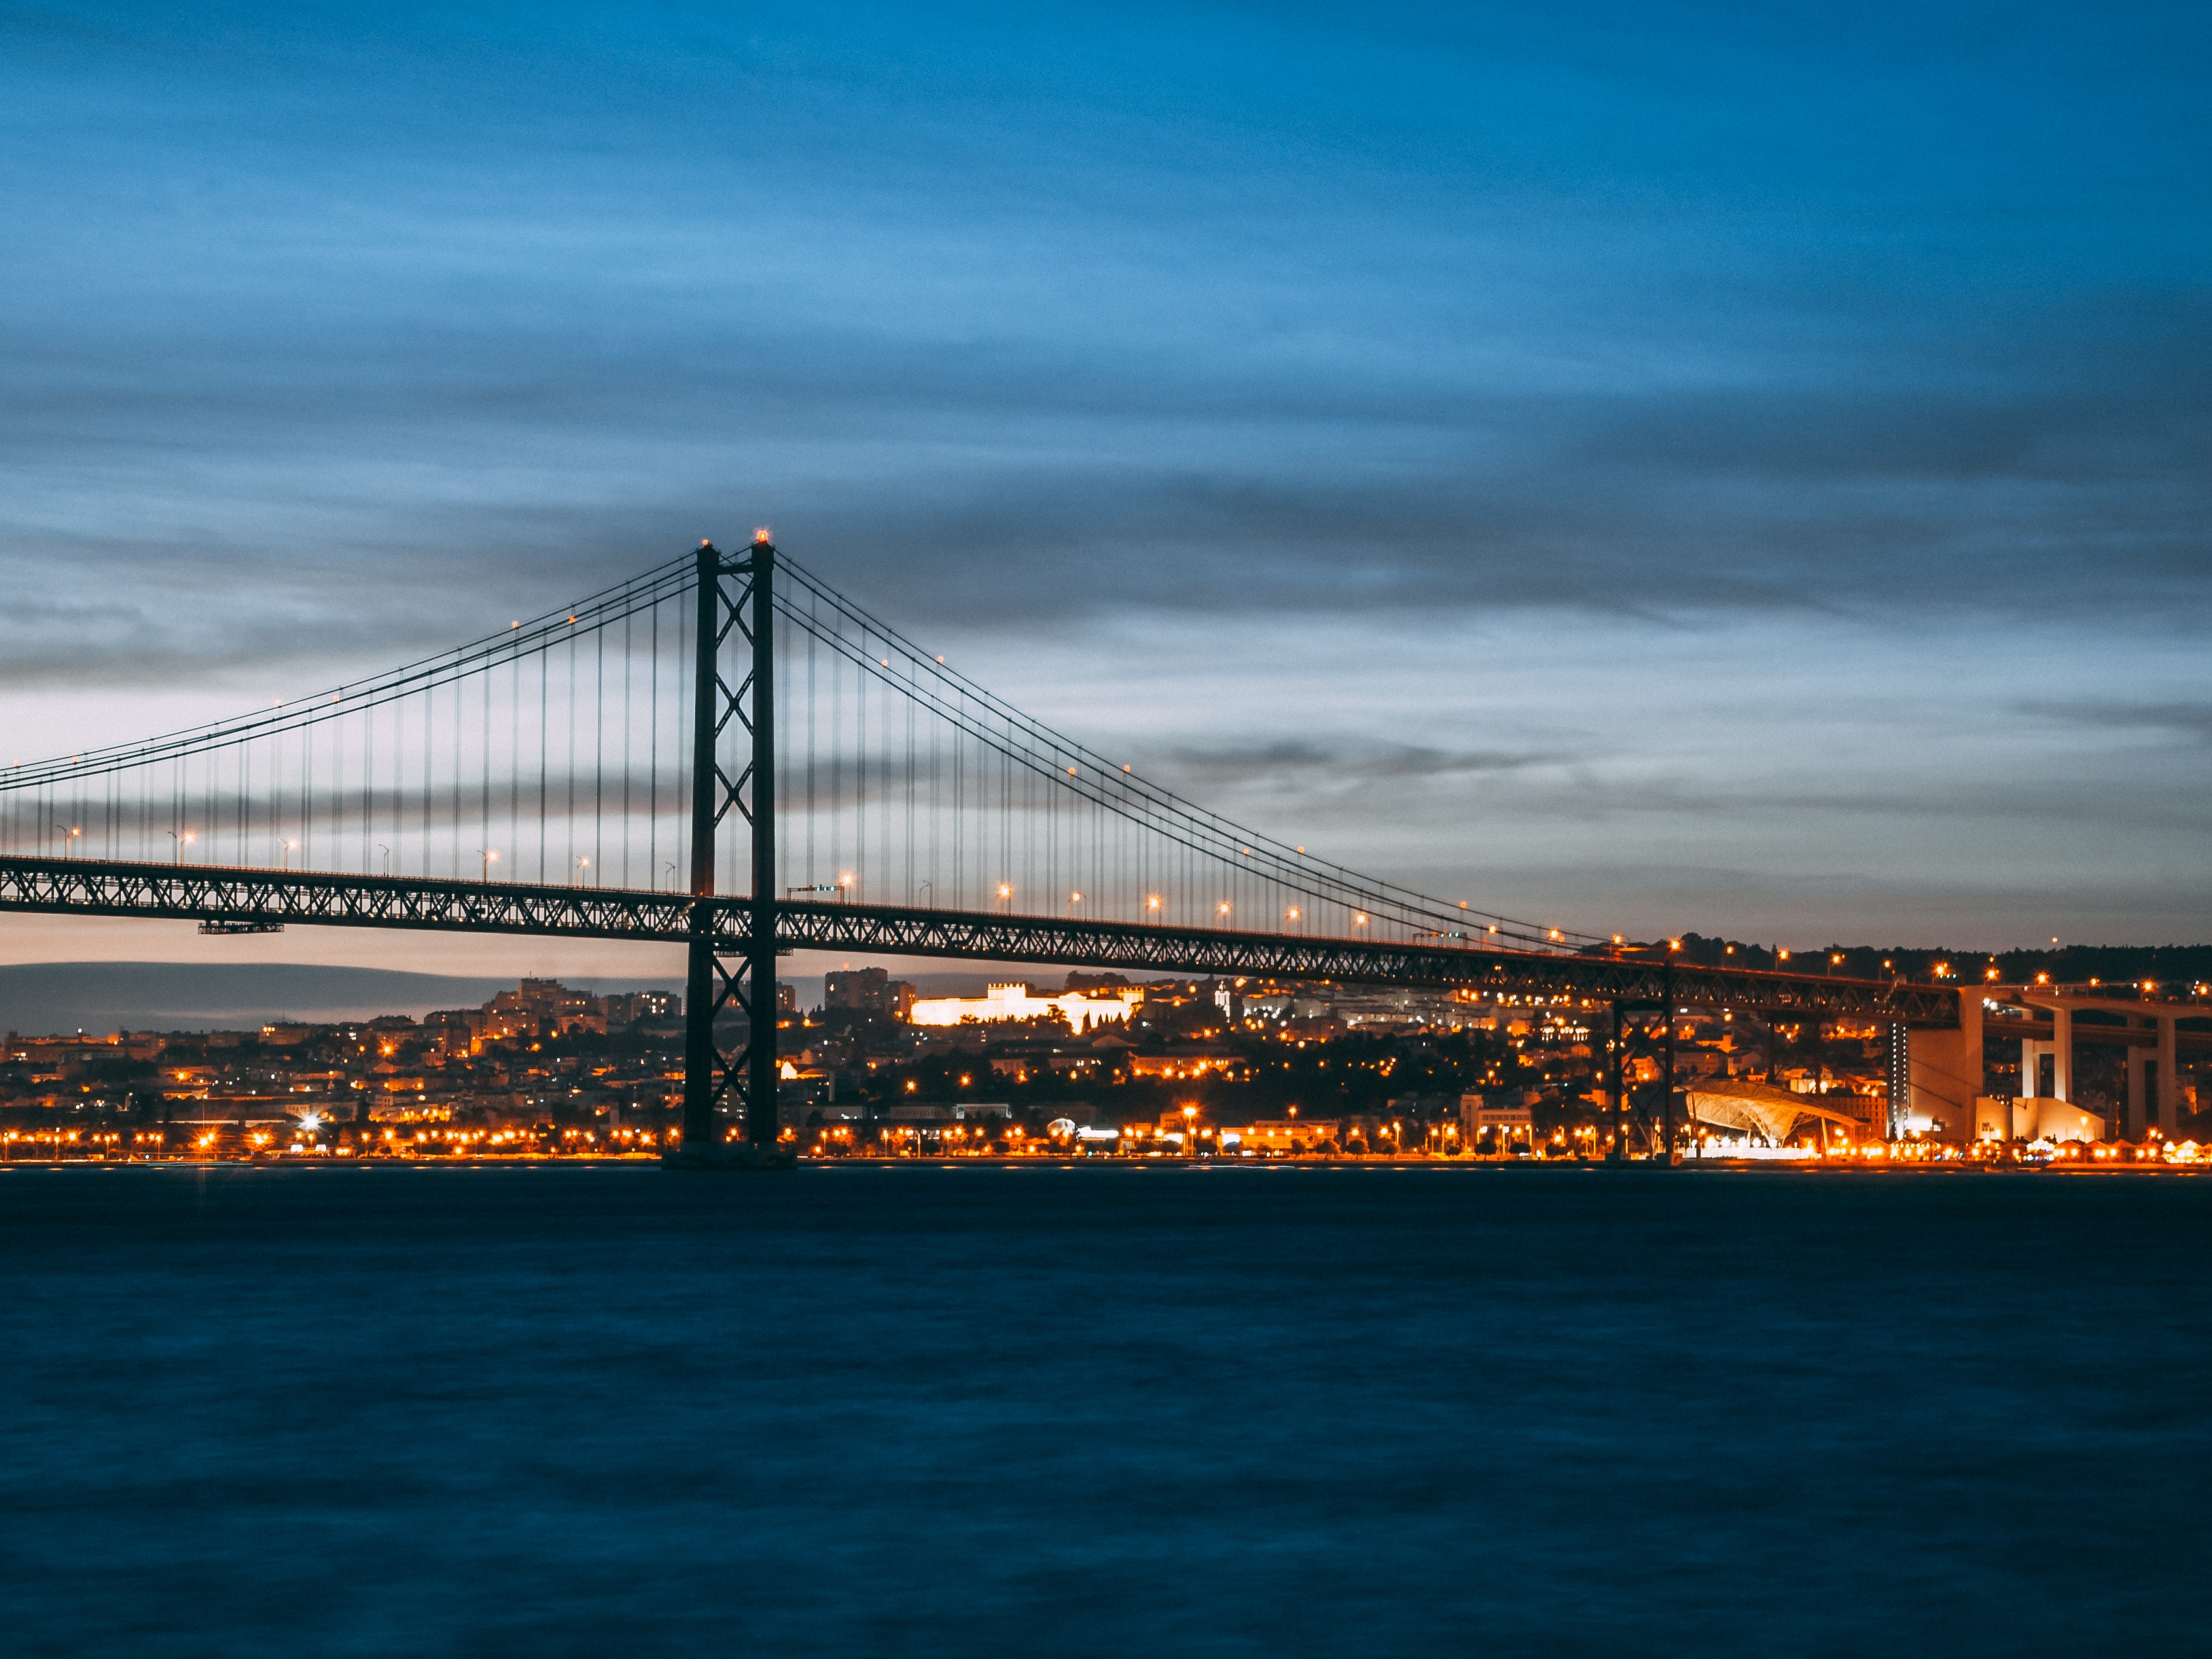 concrete bridge at night time